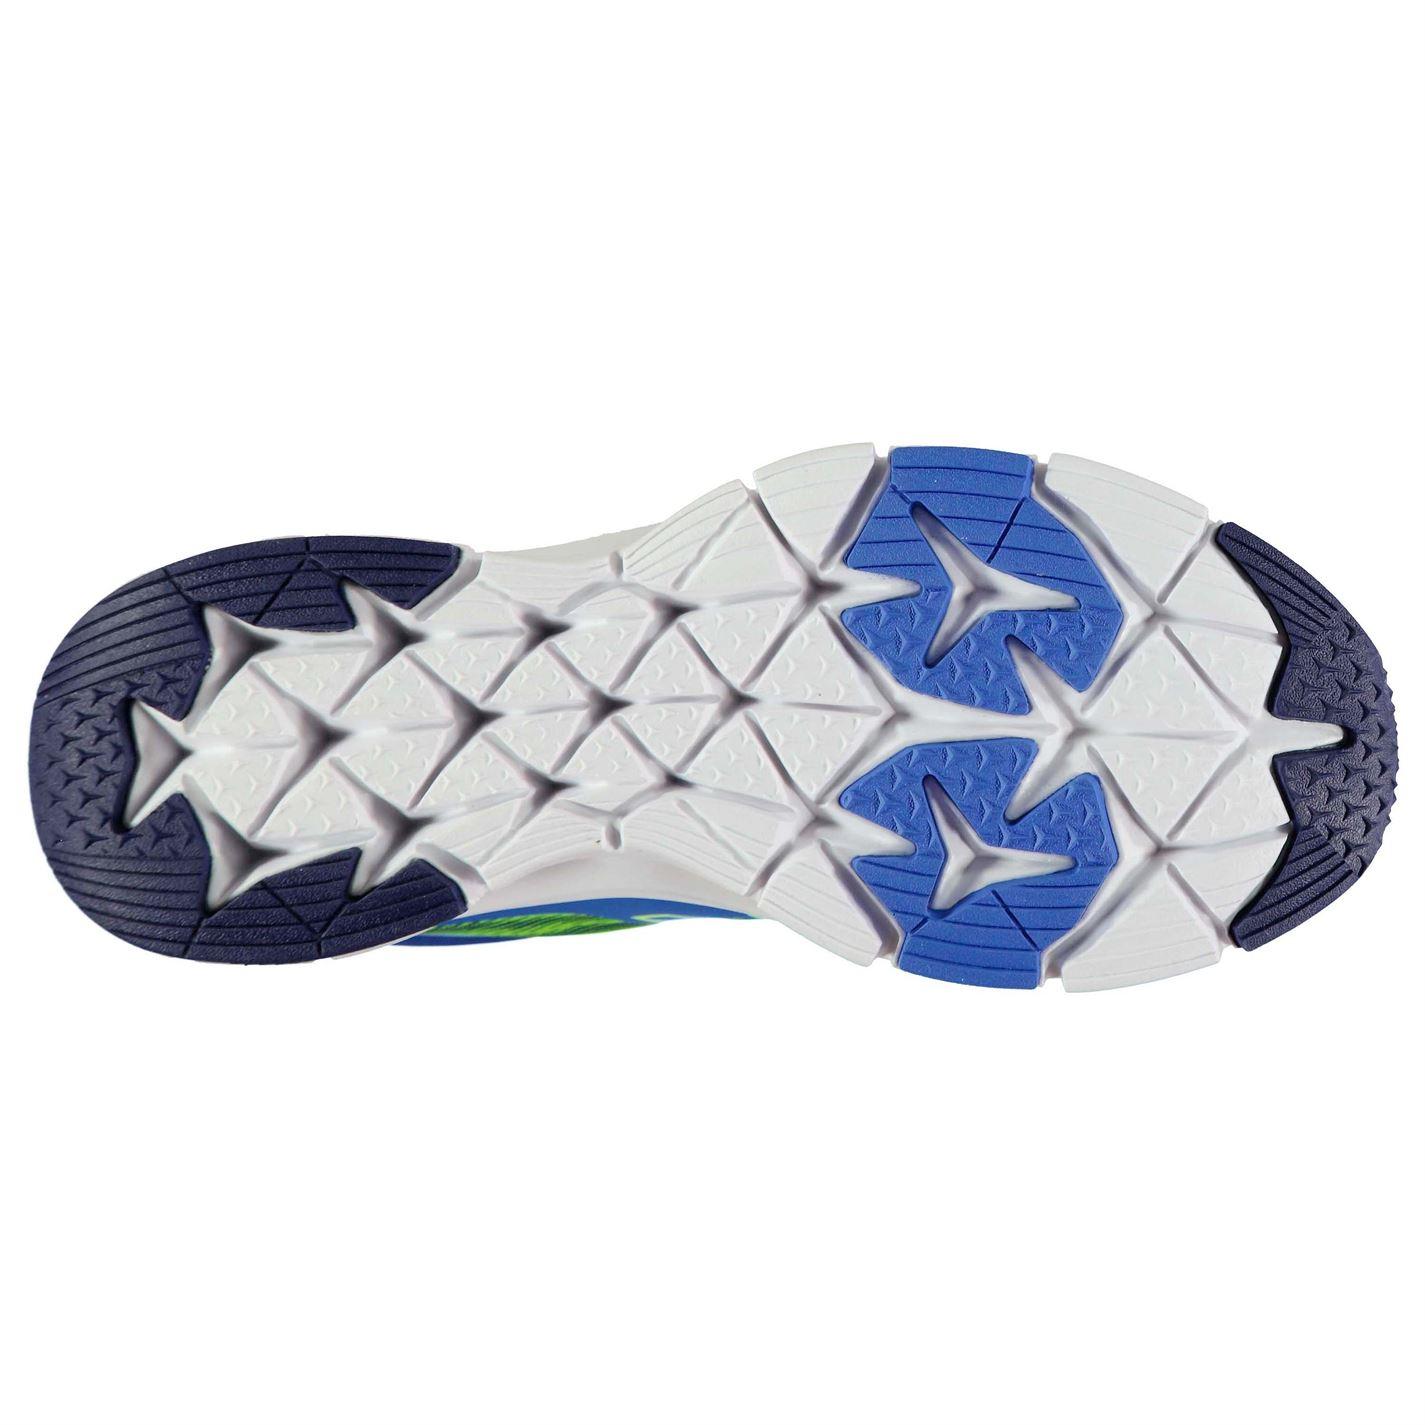 Tenis-New-Balance-RIFM-v1-para-hombre-Caballeros-De-Carretera-Zapatillas-Cordones-atados miniatura 9